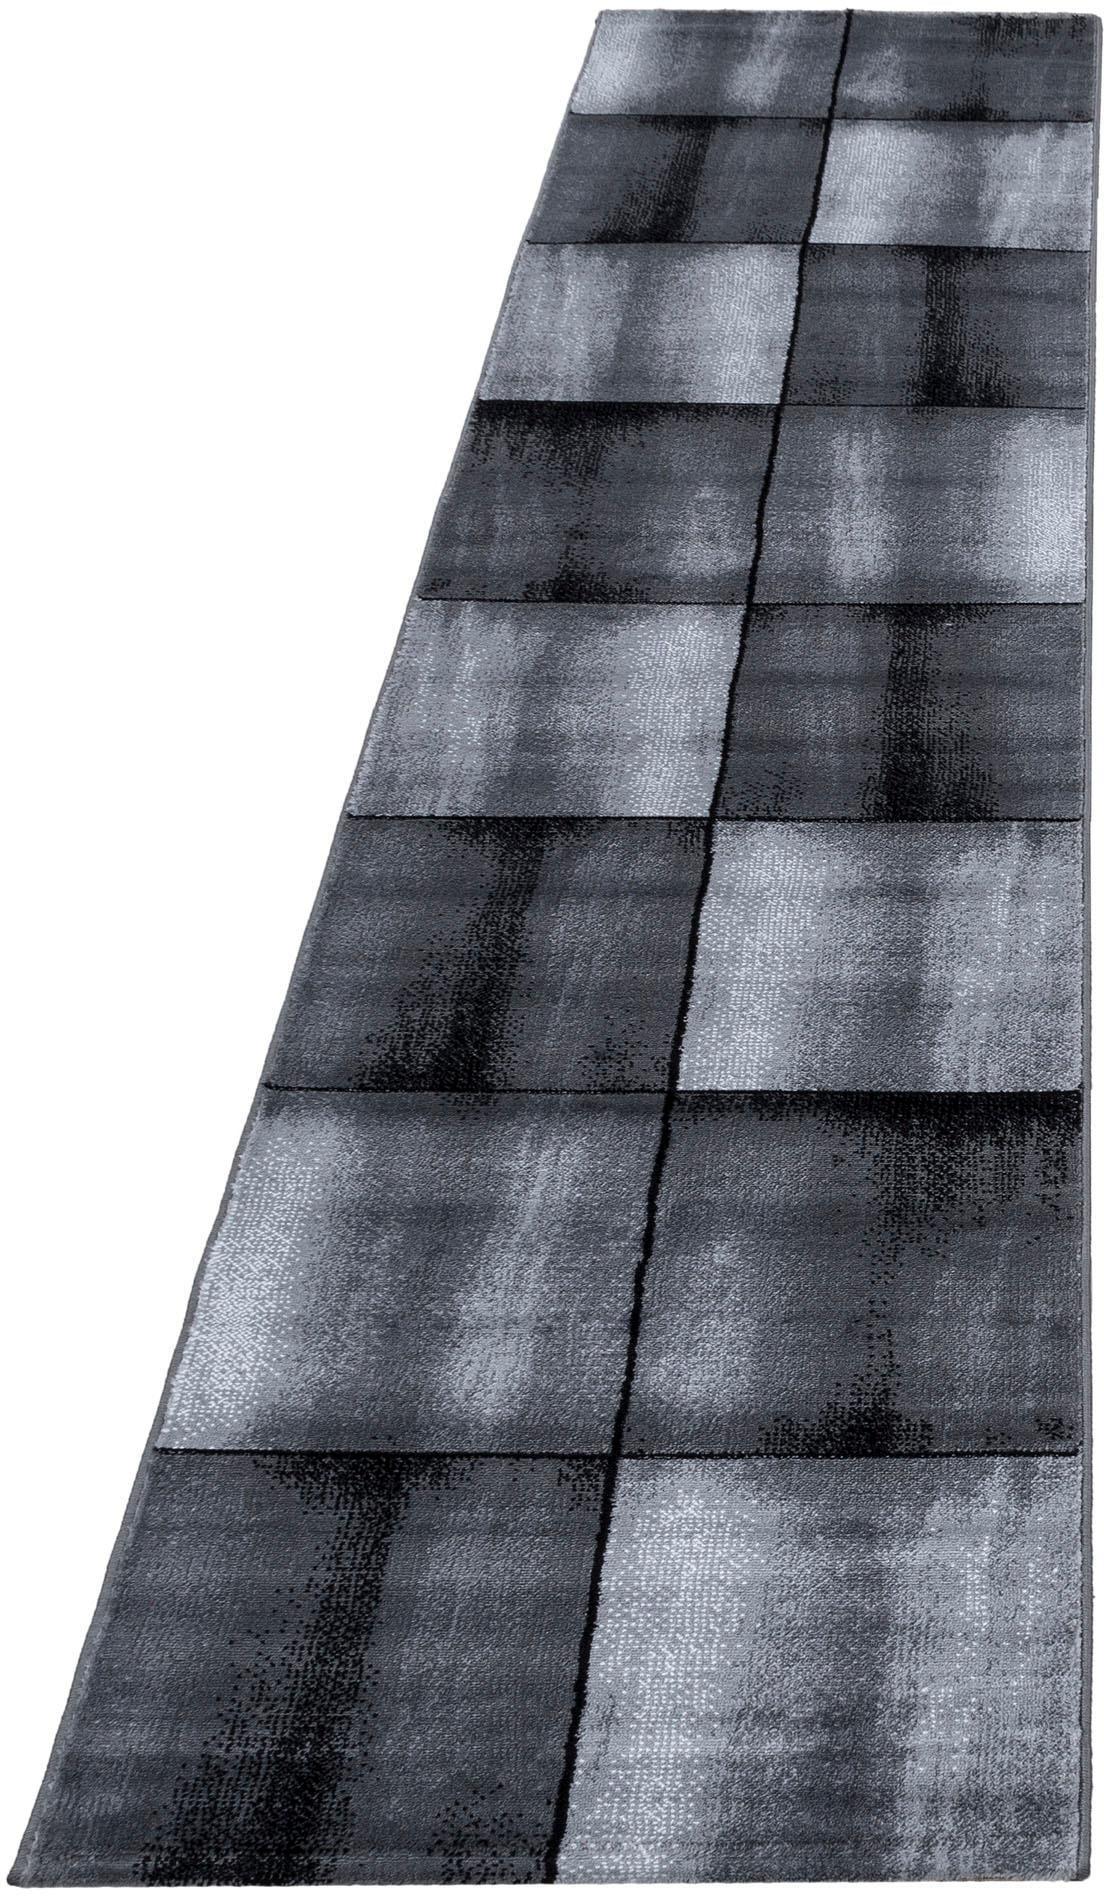 Läufer Parma 9320 Ayyildiz rechteckig Höhe 9 mm maschinell gewebt